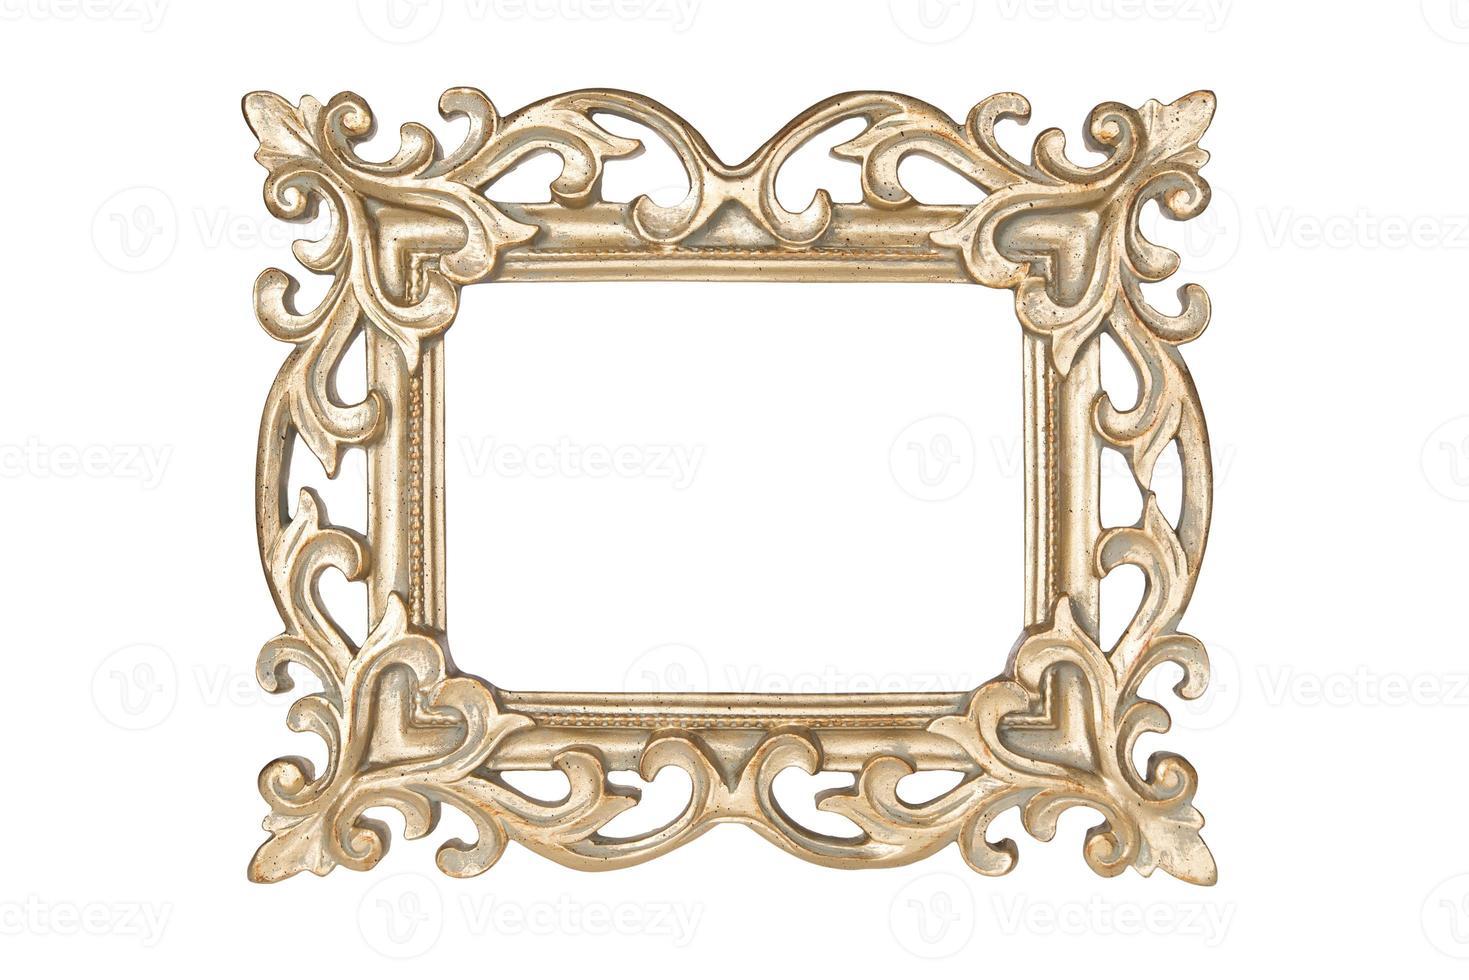 moldura esculpida em ouro foto